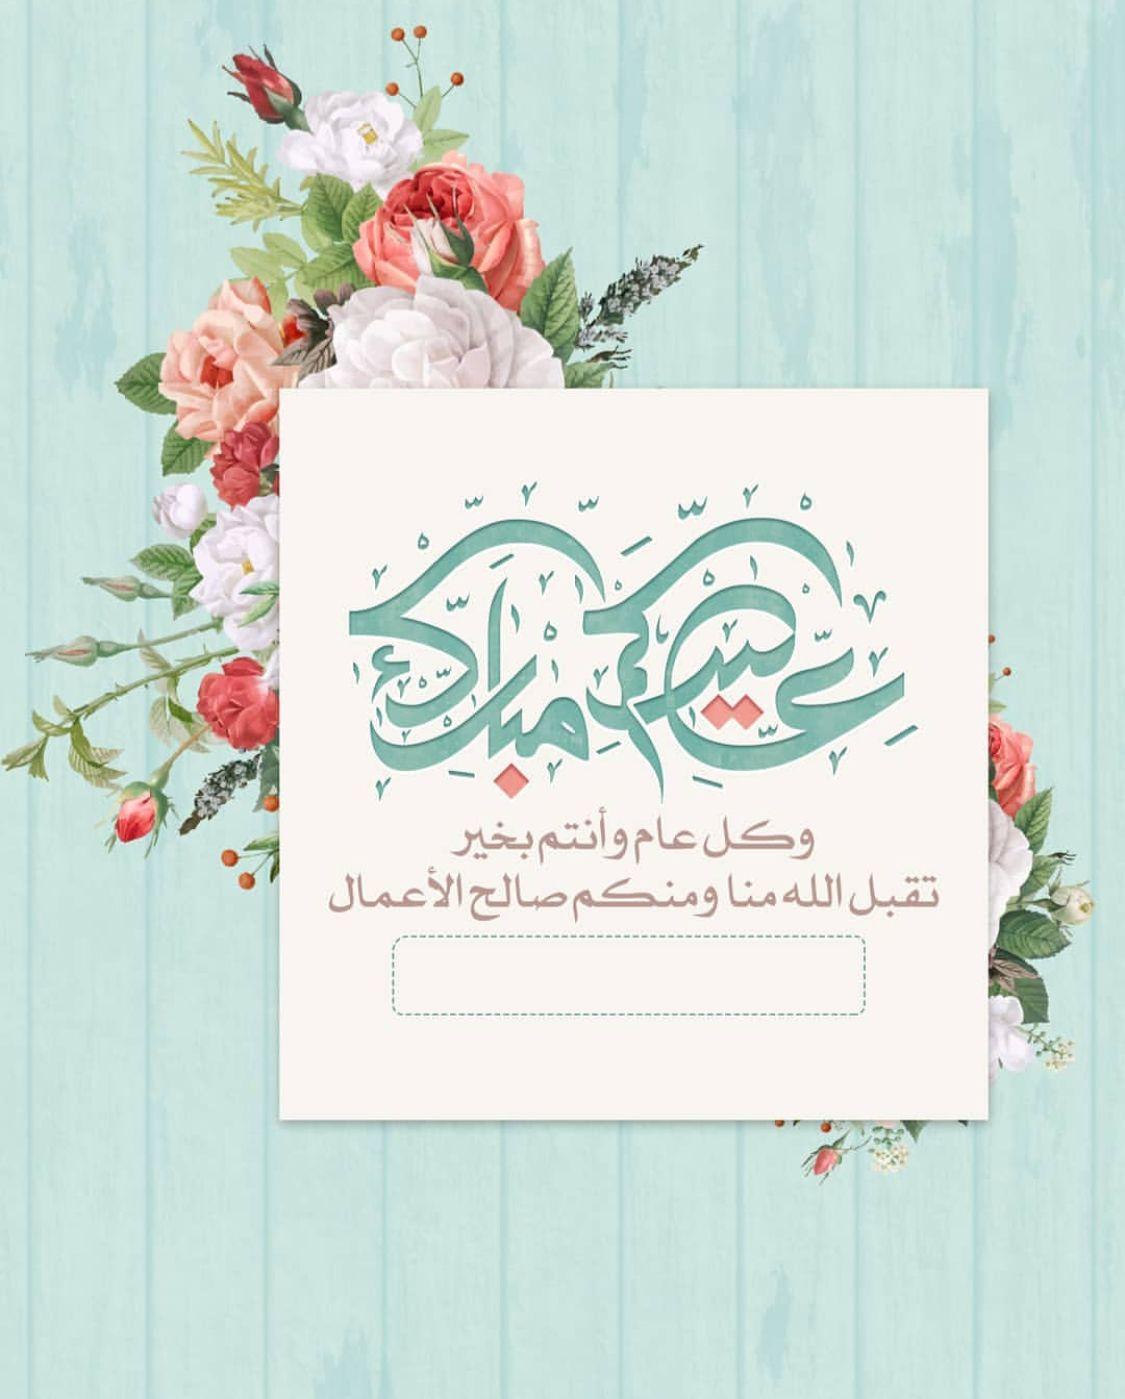 Pin By Meme On عيد الفطر عيد الأضحى Eid Mubark Eid Stickers Eid Card Designs Eid Cards